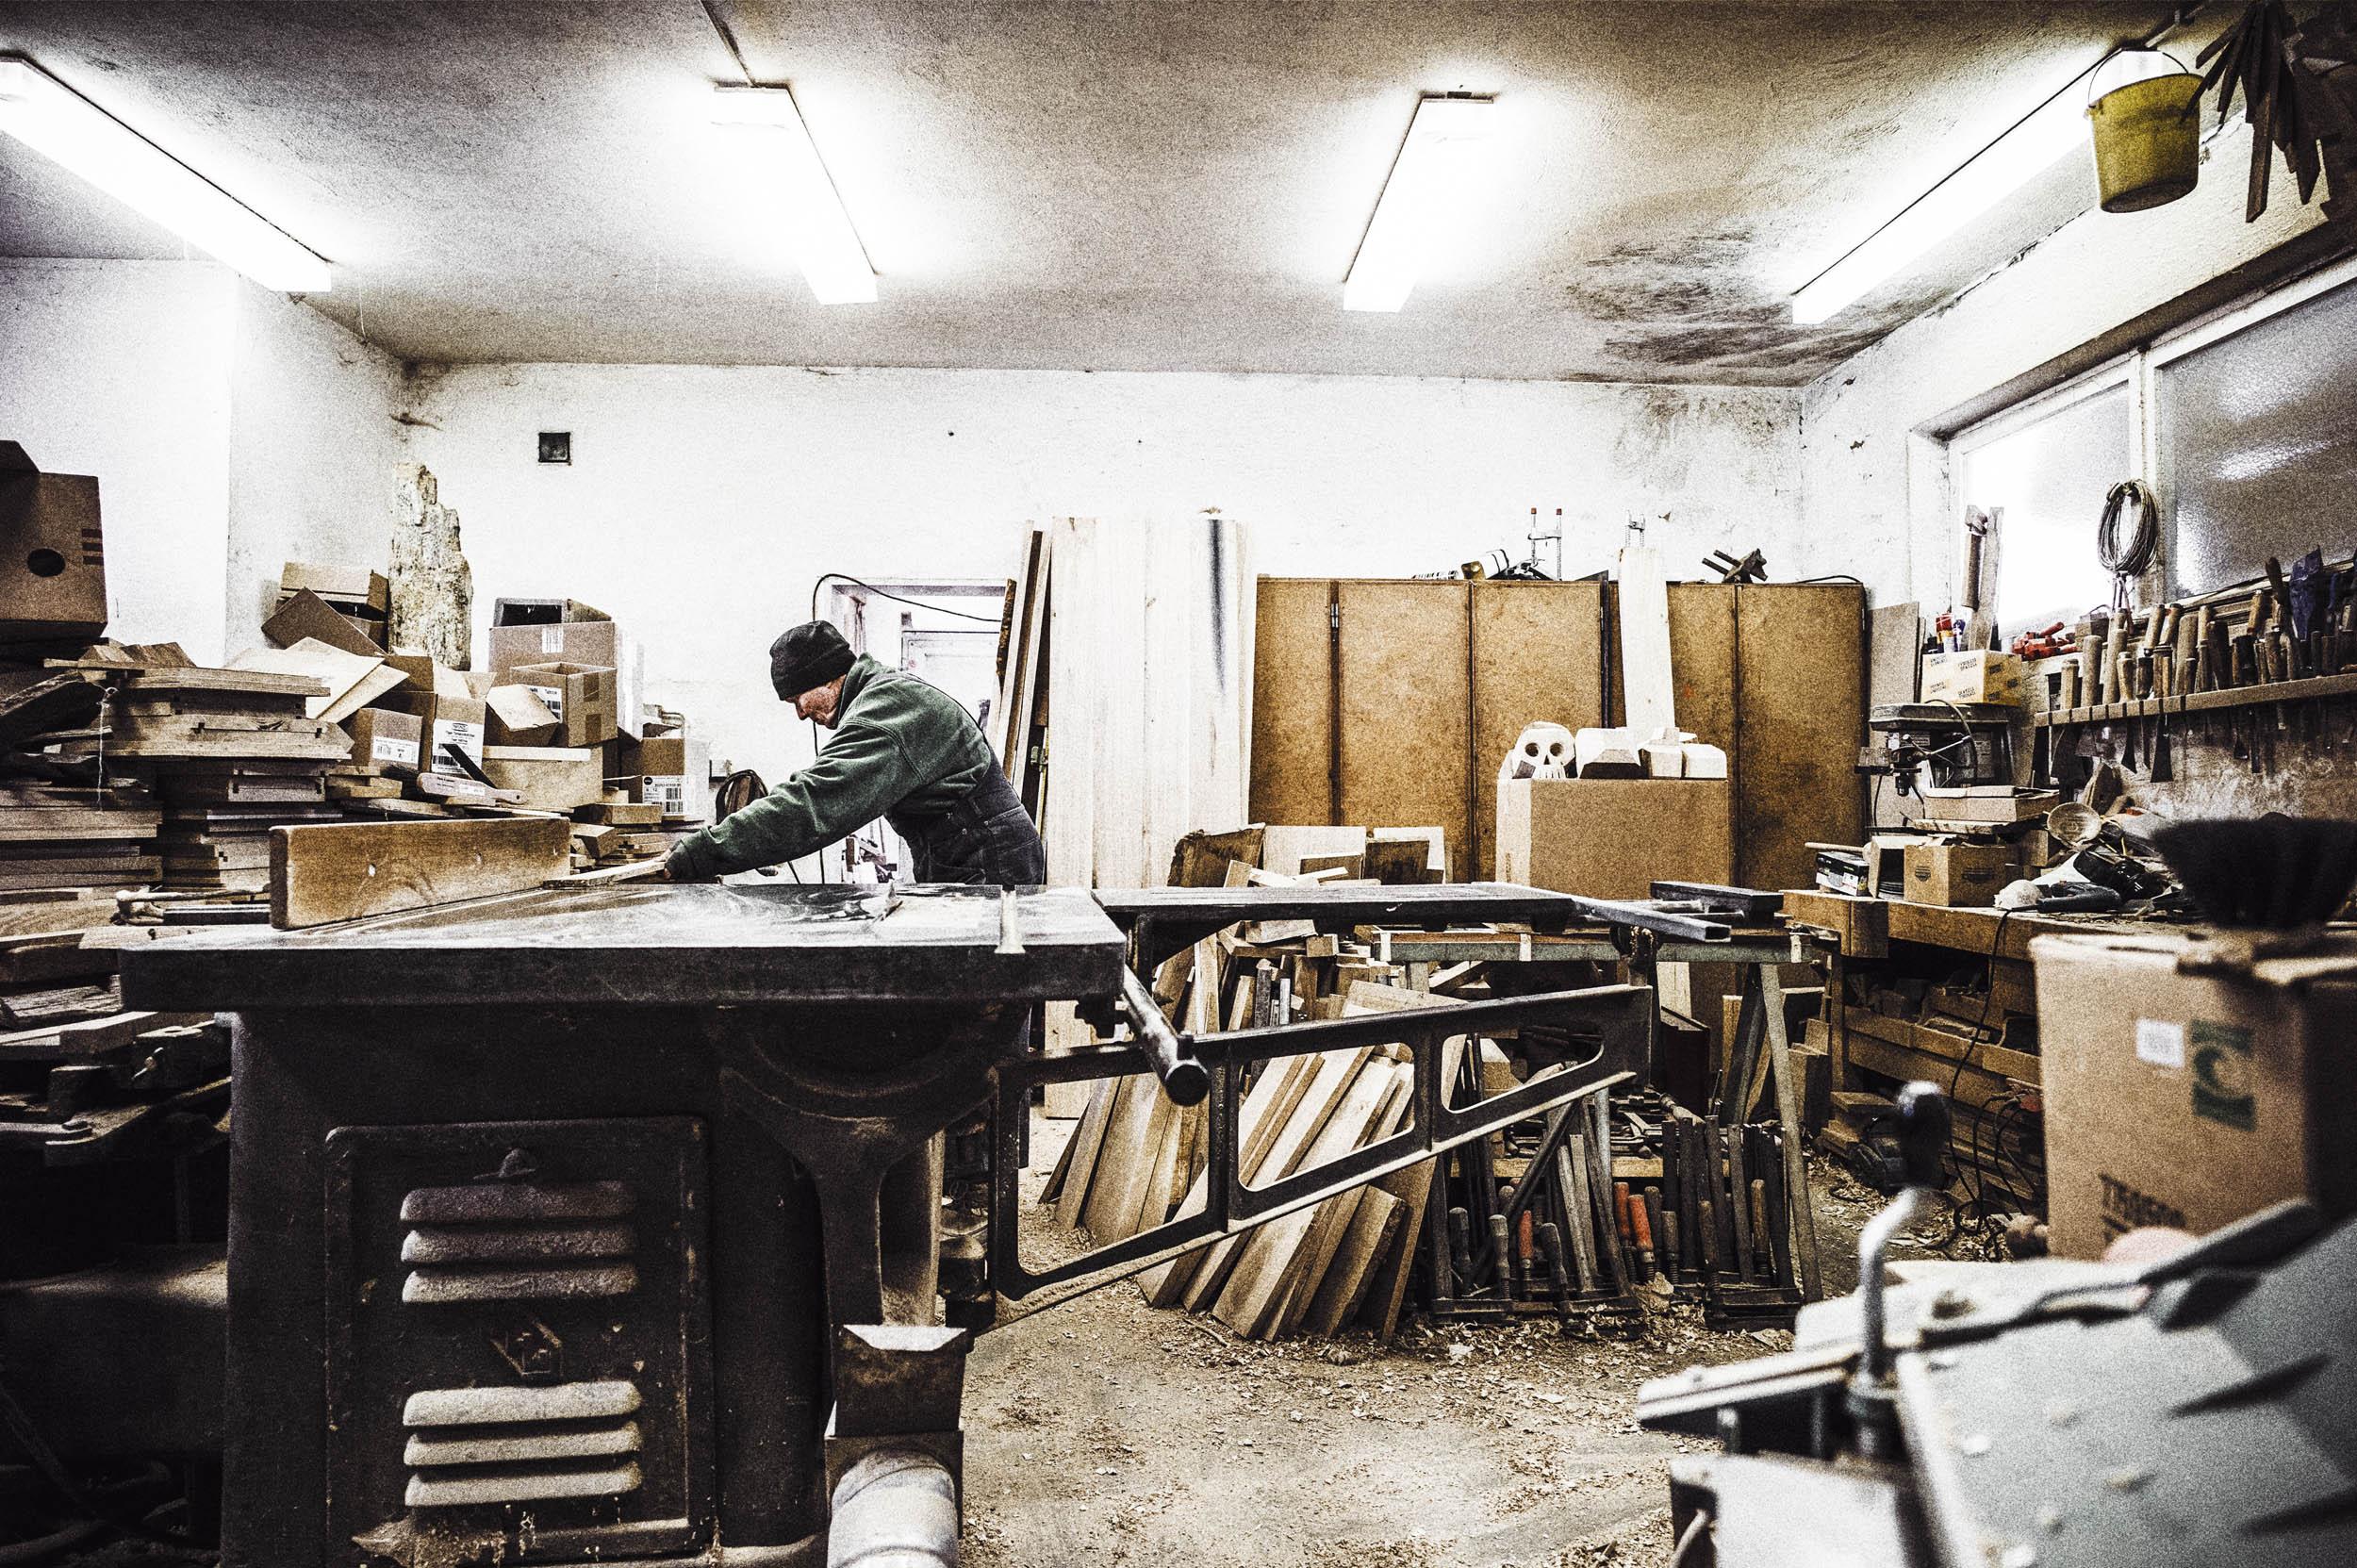 seifertuebler-corporate-handcraft-woodsculpture-vogel-06.jpg